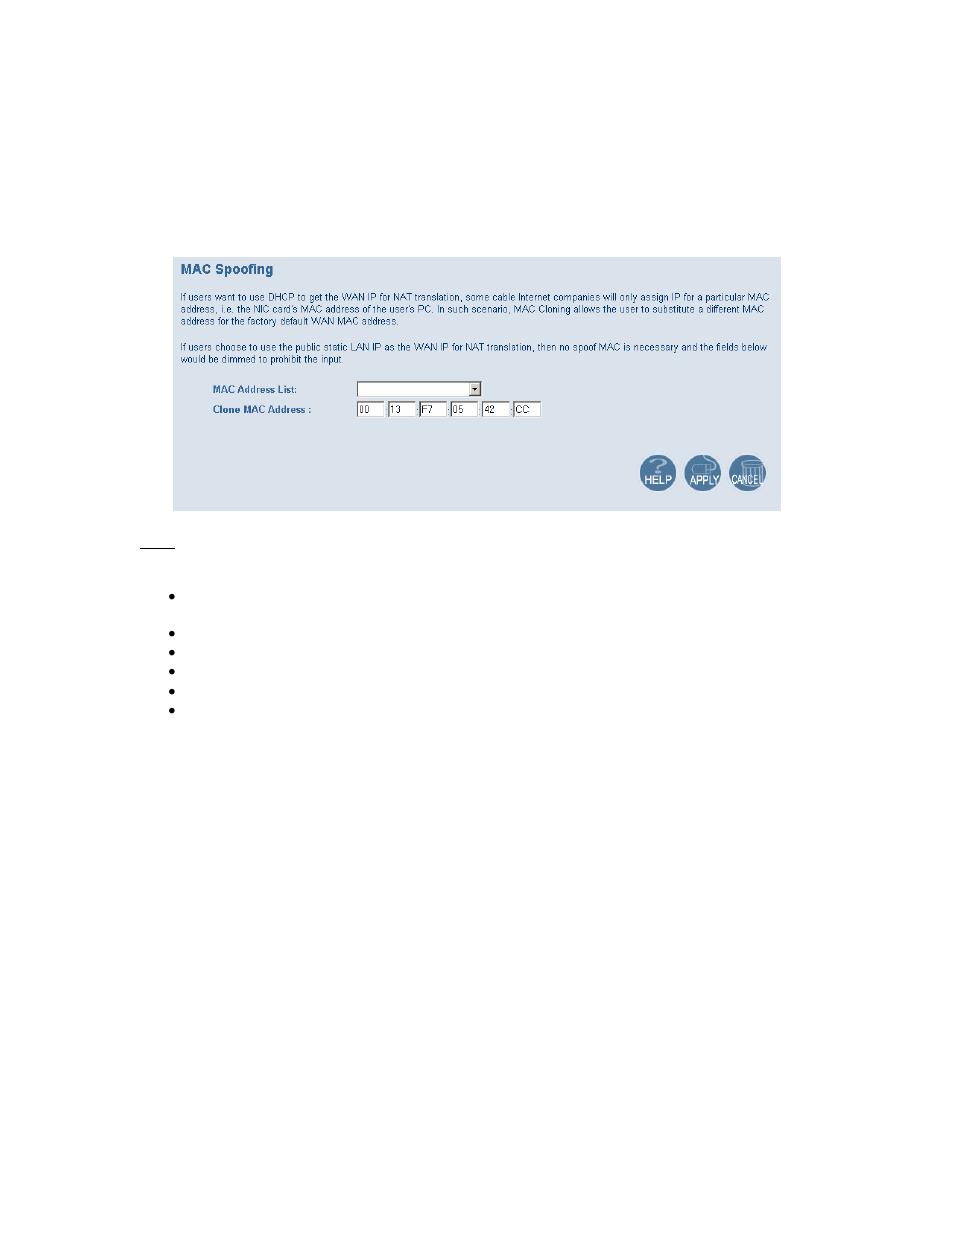 smc networks smc8014w g user manual page 19 60 original mode rh manualsdir com SMC8014W -G SMC SMC8014W -G SMC